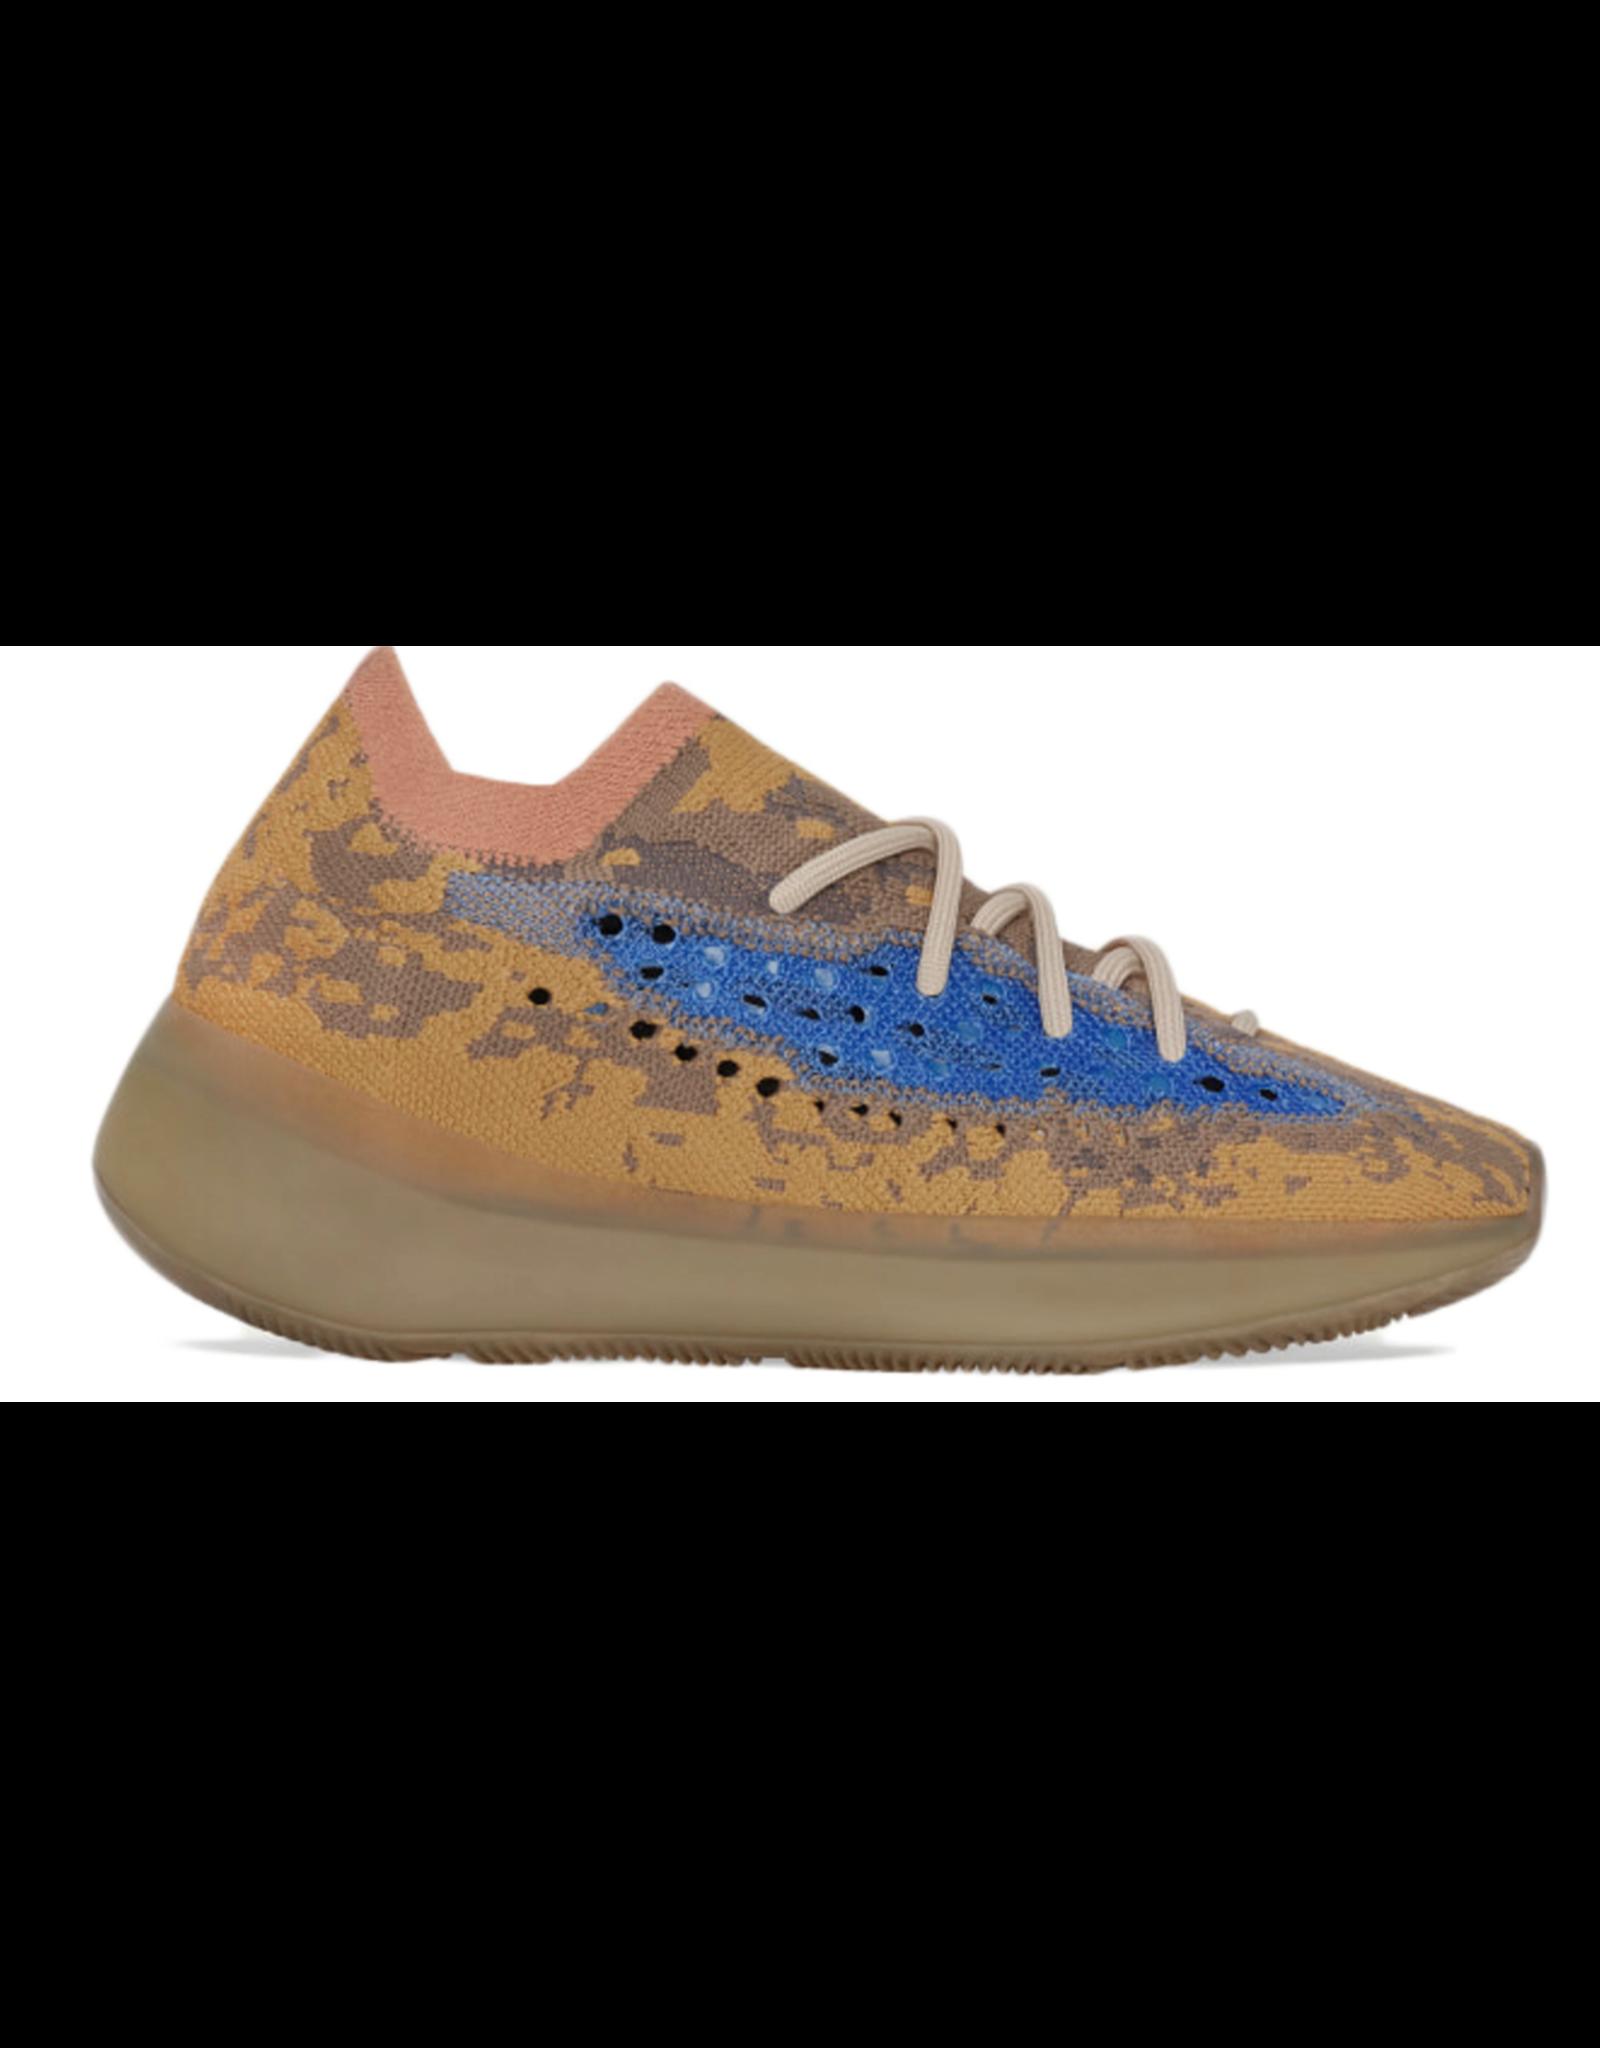 YEEZY adidas Yeezy Boost 380 Blue Oat